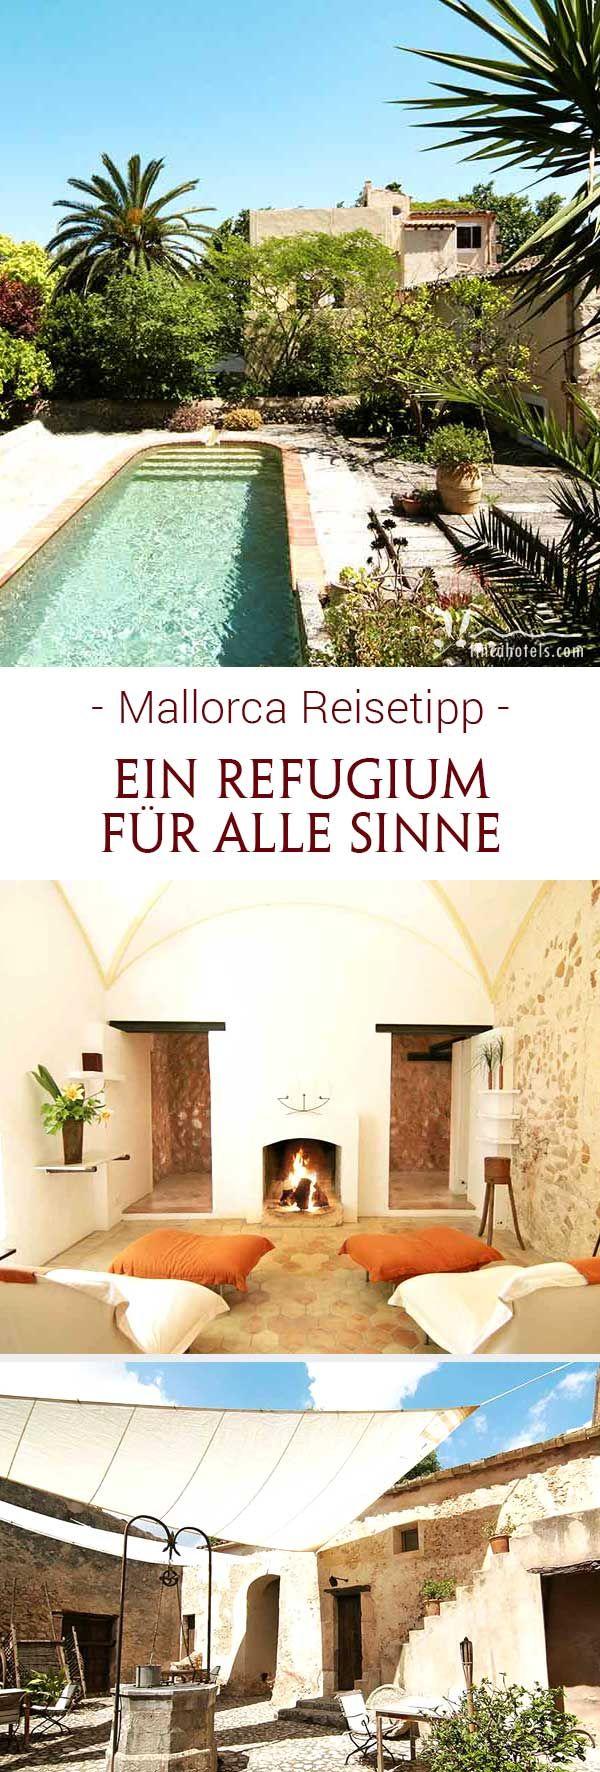 best 25+ hotel refugio ideas on pinterest | hotel atibaia, hotel ... - Herrenhaus 12 Jahrhundert Modernen Hotel